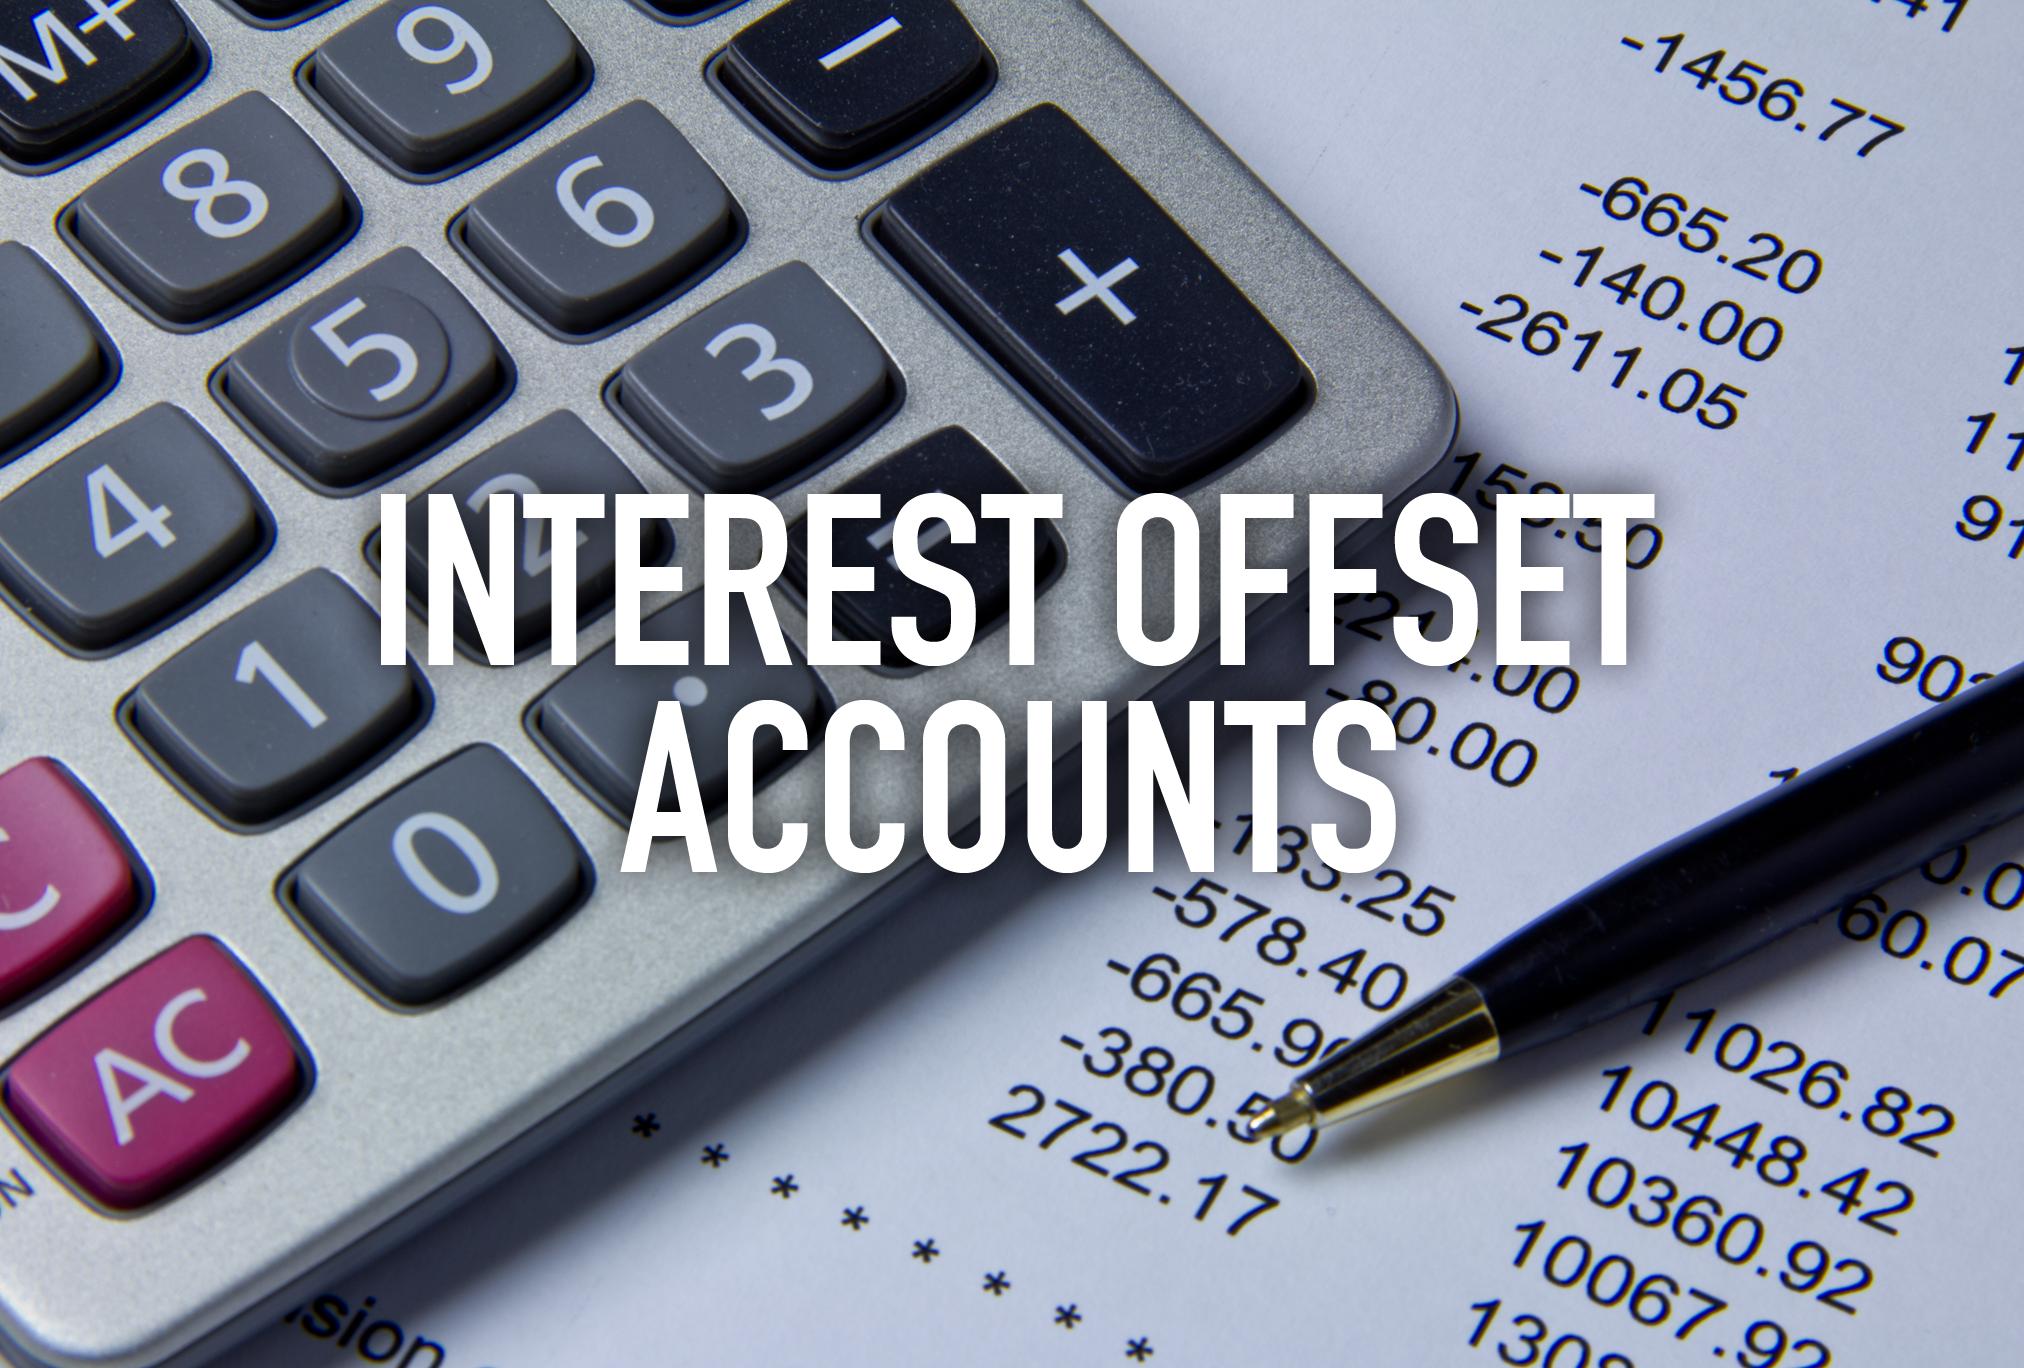 Interest Offset Accounts